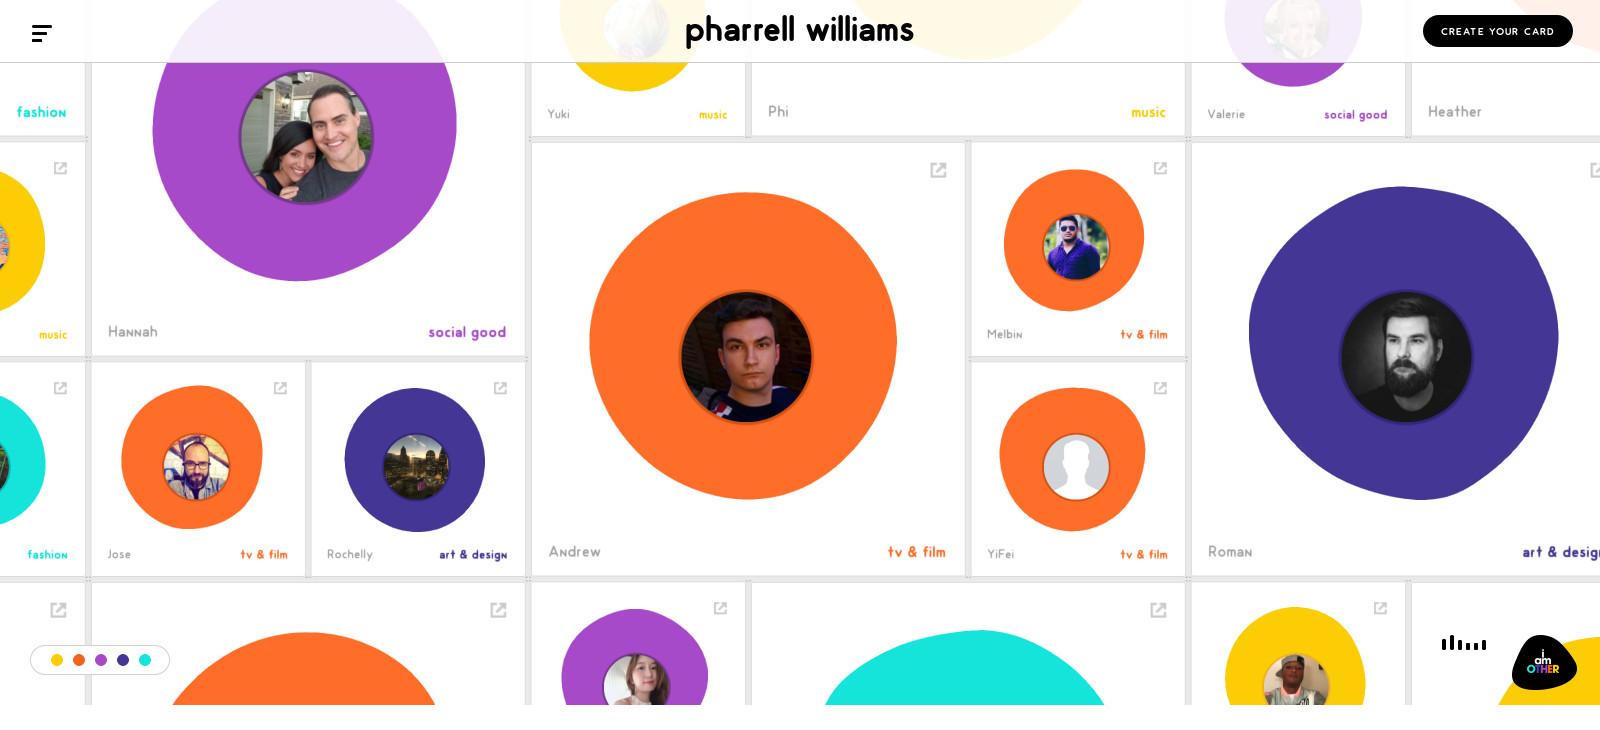 pharrellwilliams